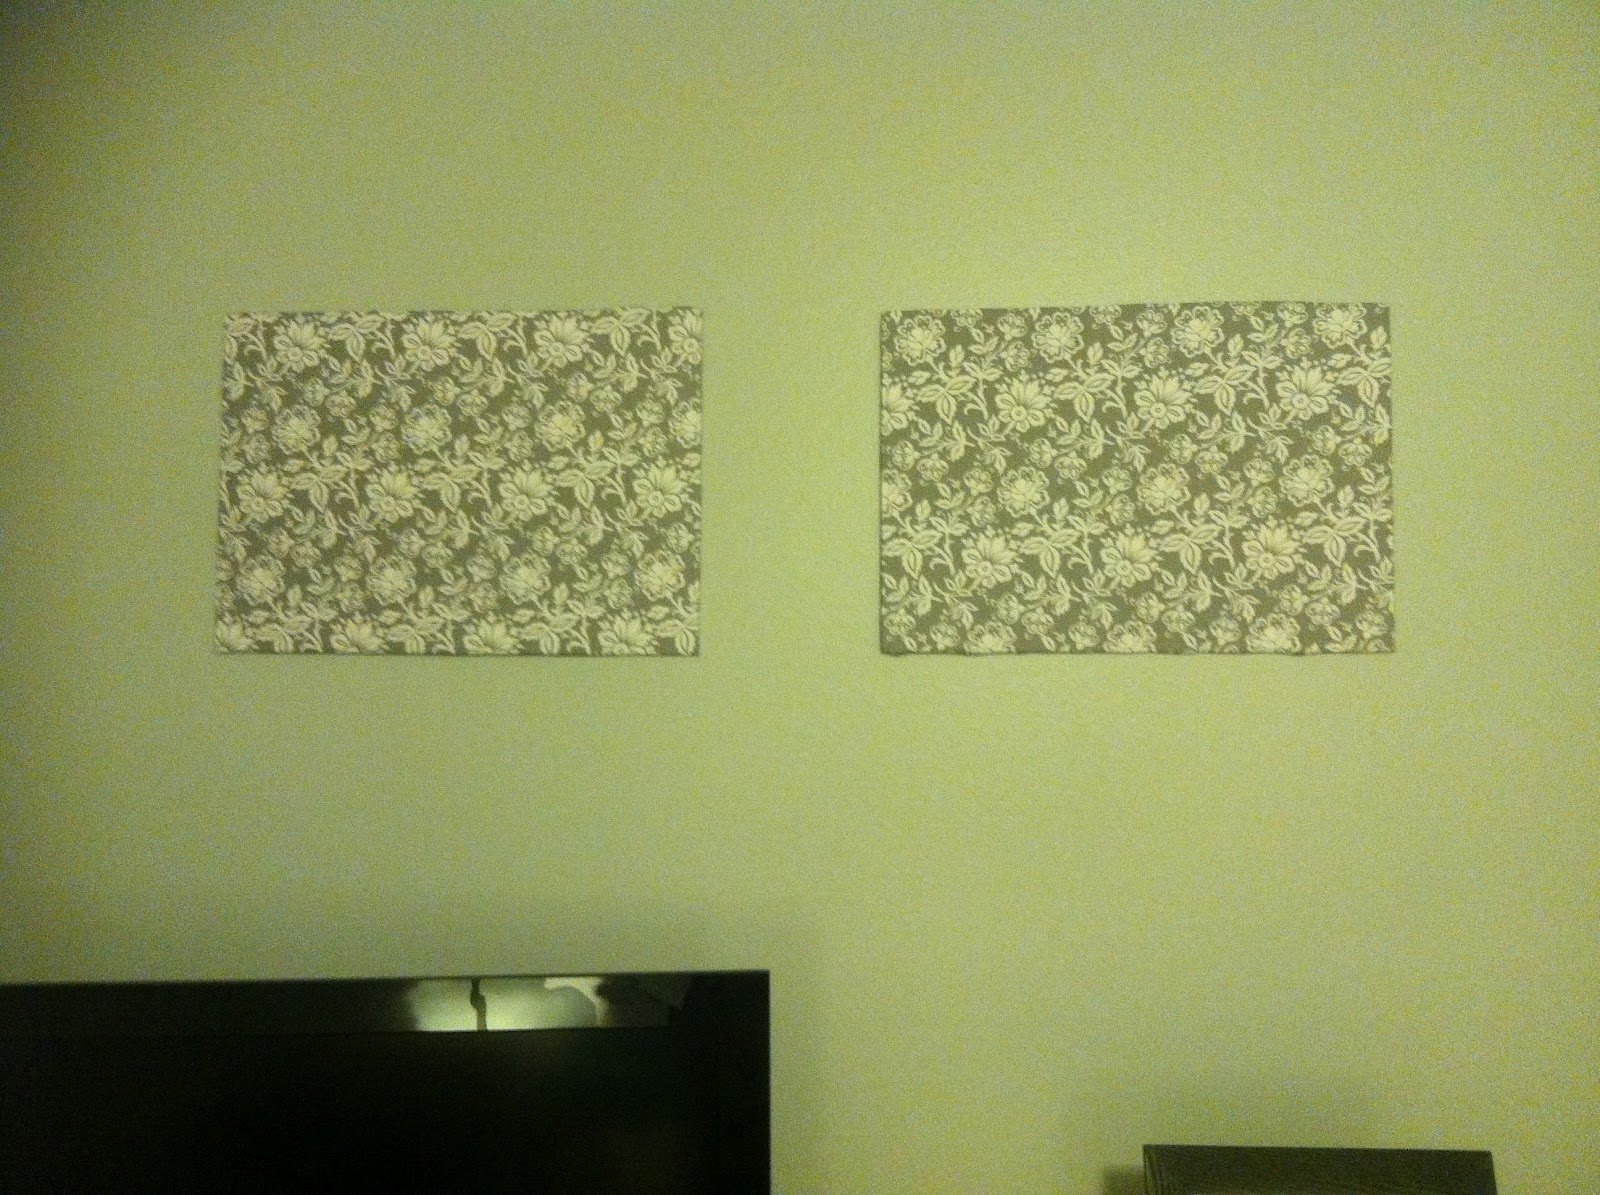 Fabric Wall Art Foam Board – Supertechcrowntower Pertaining To Current Foam Board Fabric Wall Art (View 5 of 15)